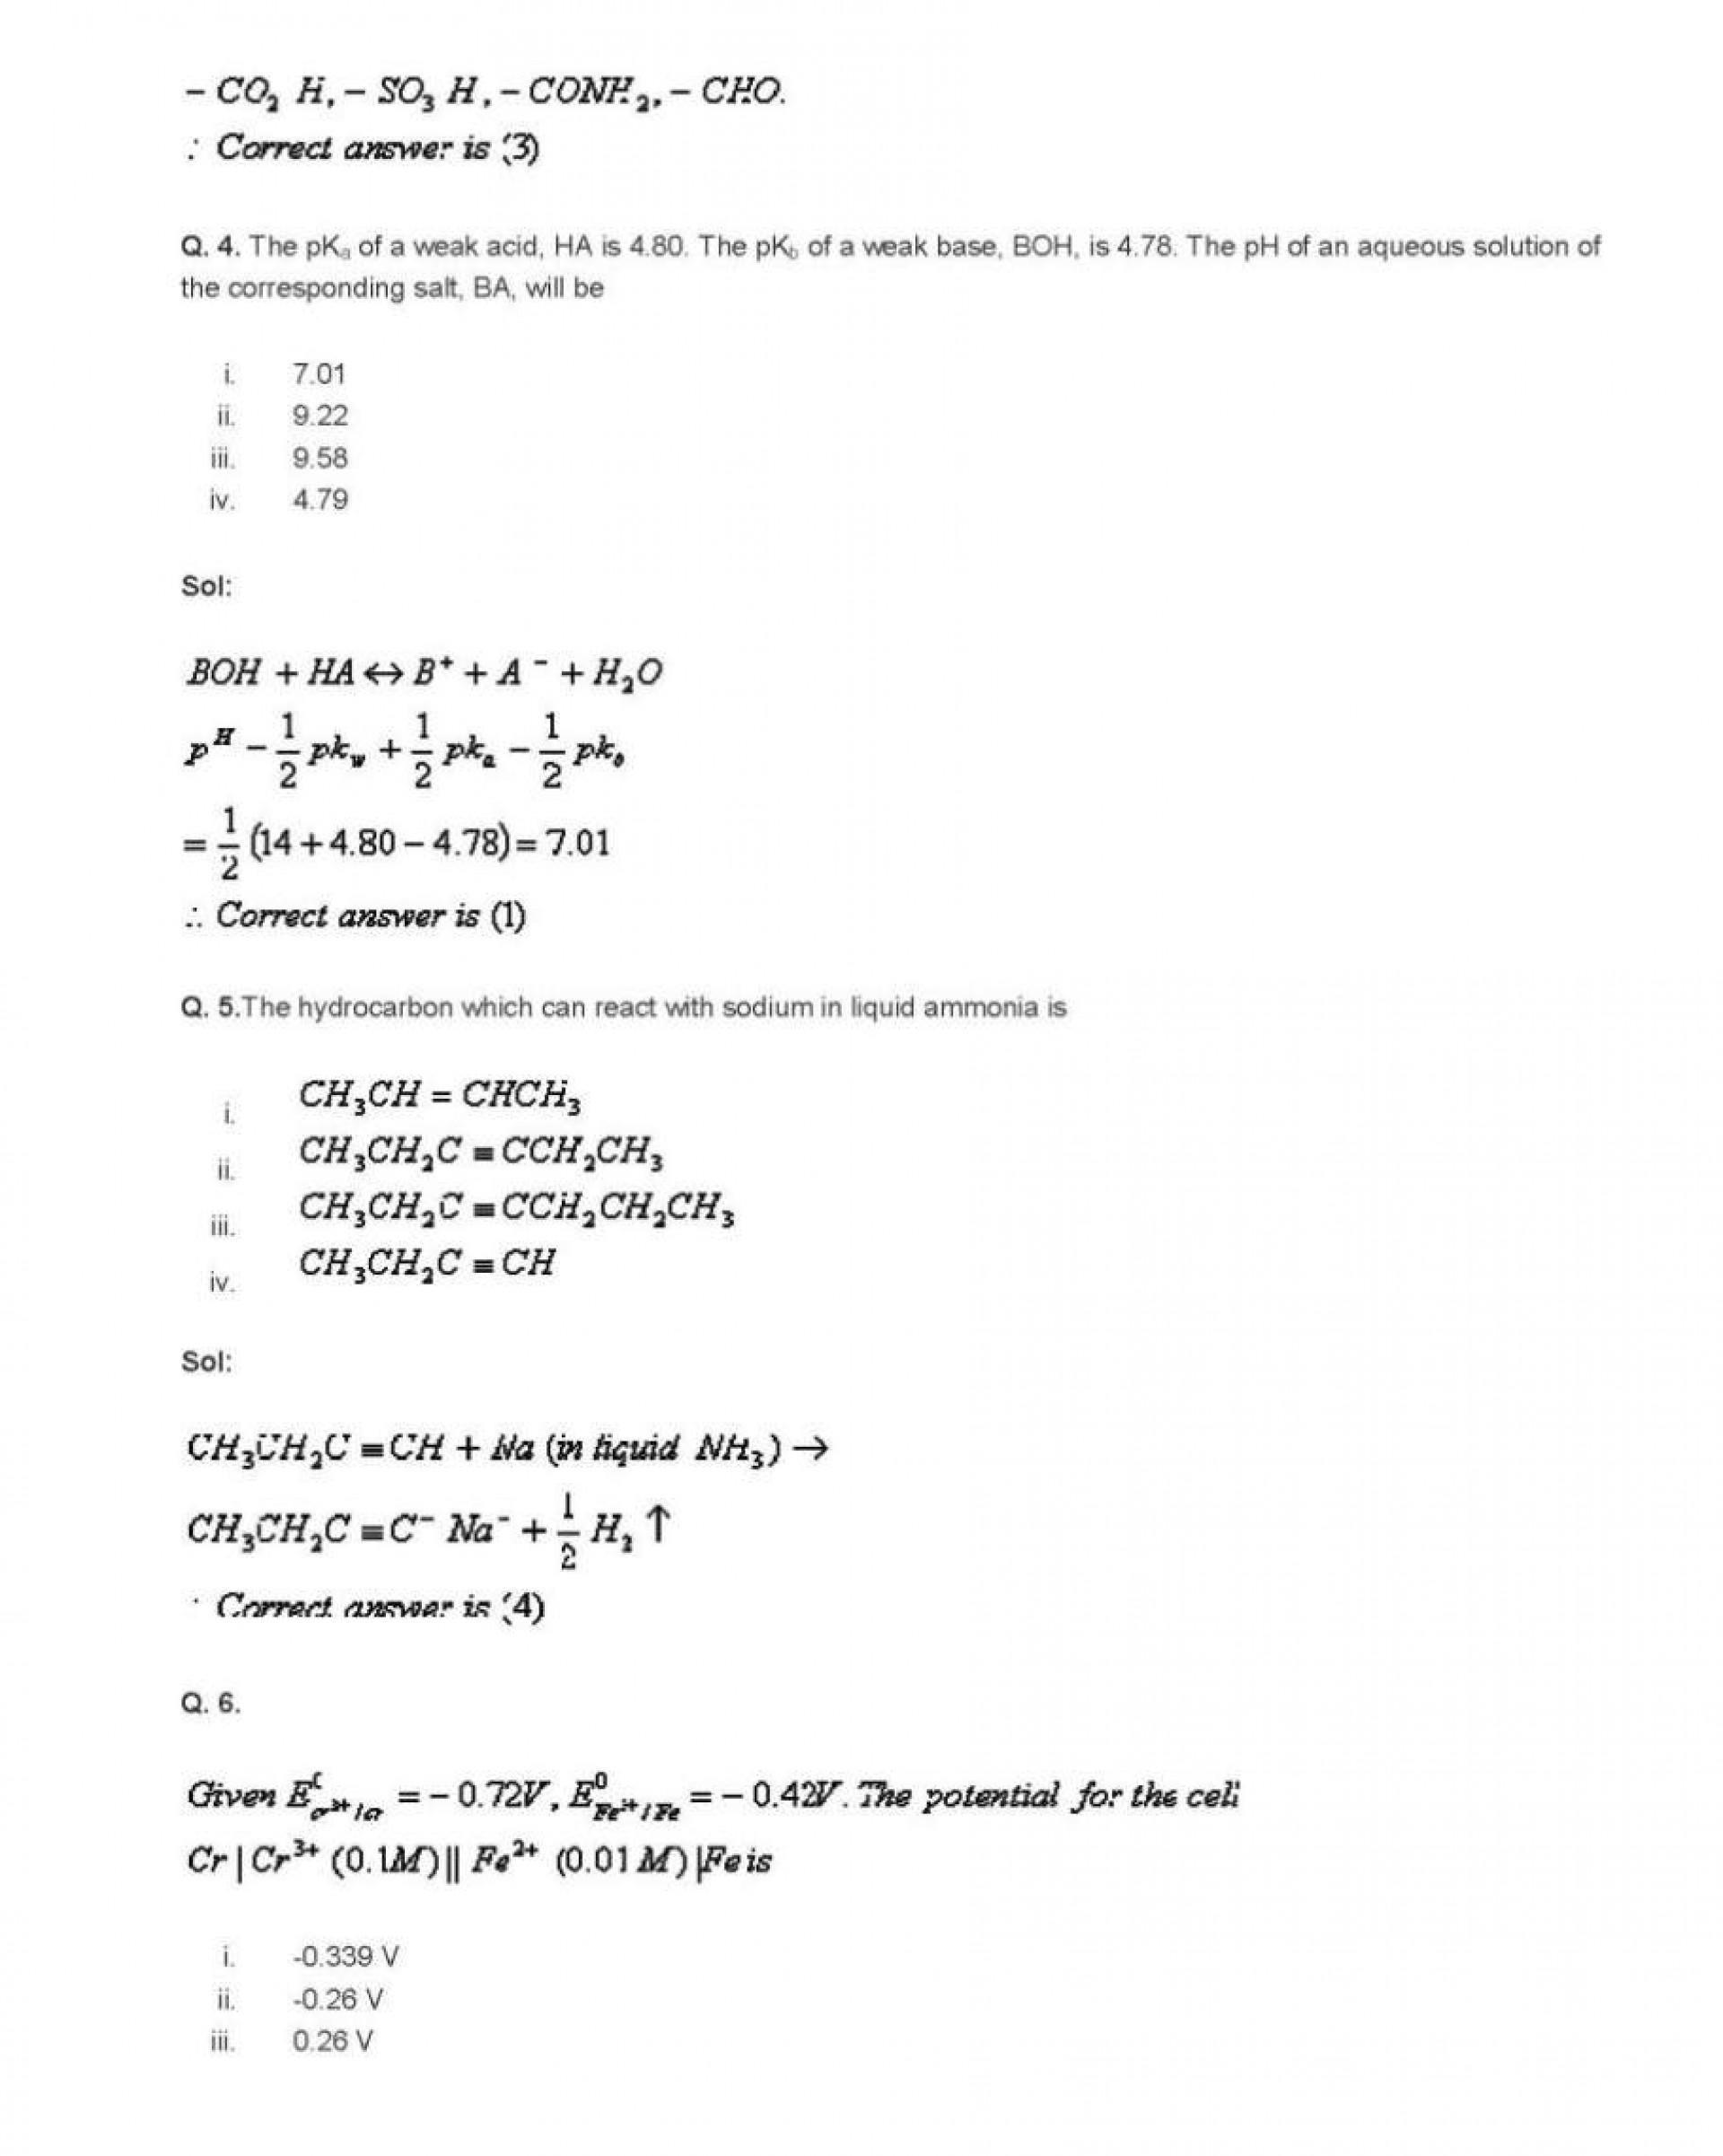 008 Essay Example Jamia Milia Tech Entrance Exam Question Paper Shocking Mentorship Mentoring Contoh 1920